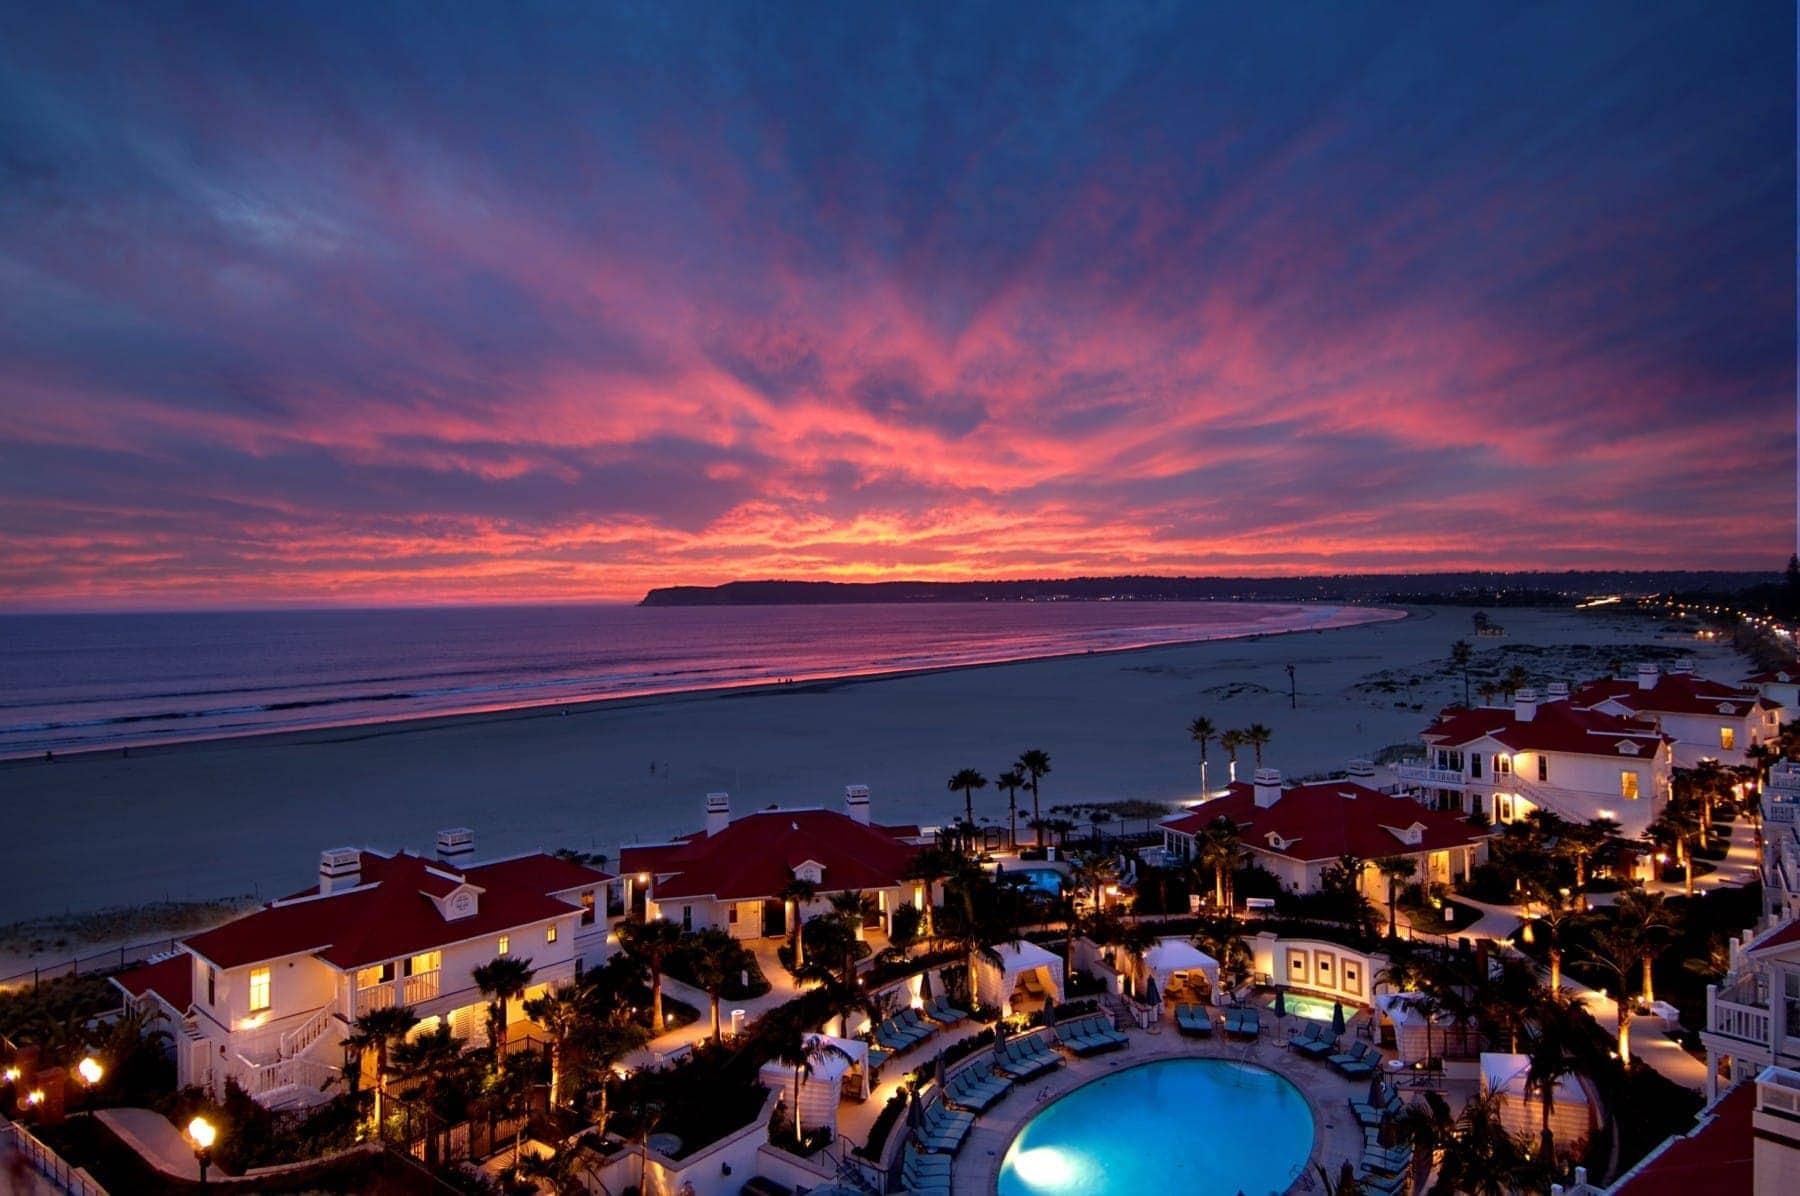 hotel del coronado at sunset